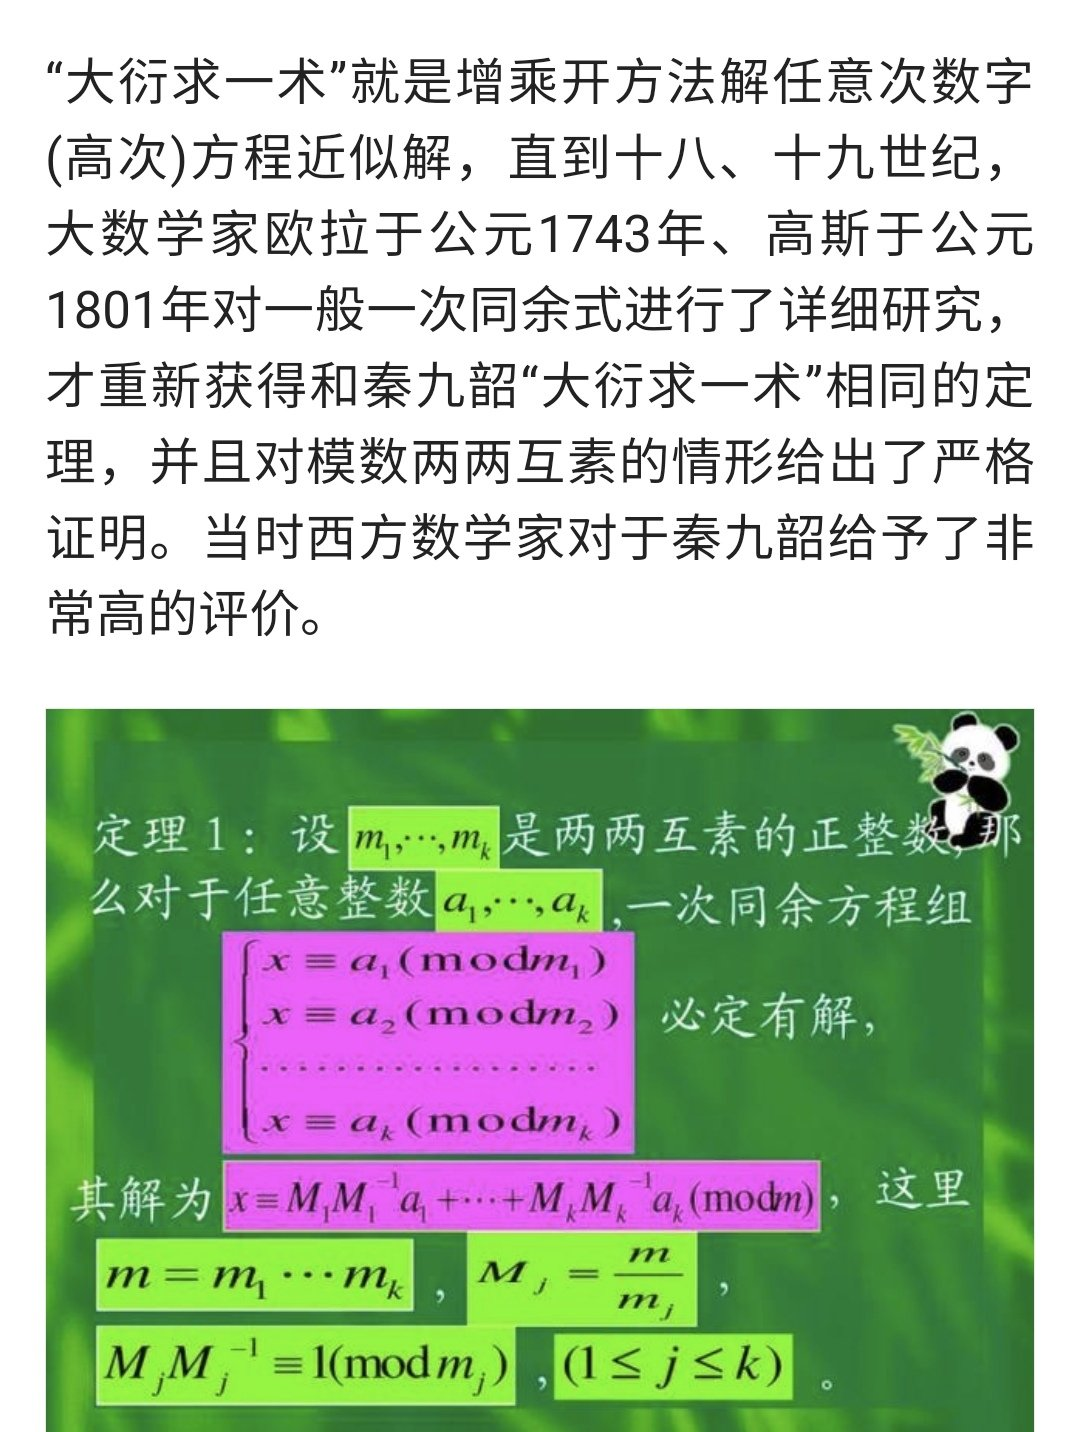 Ancient Chinese Math